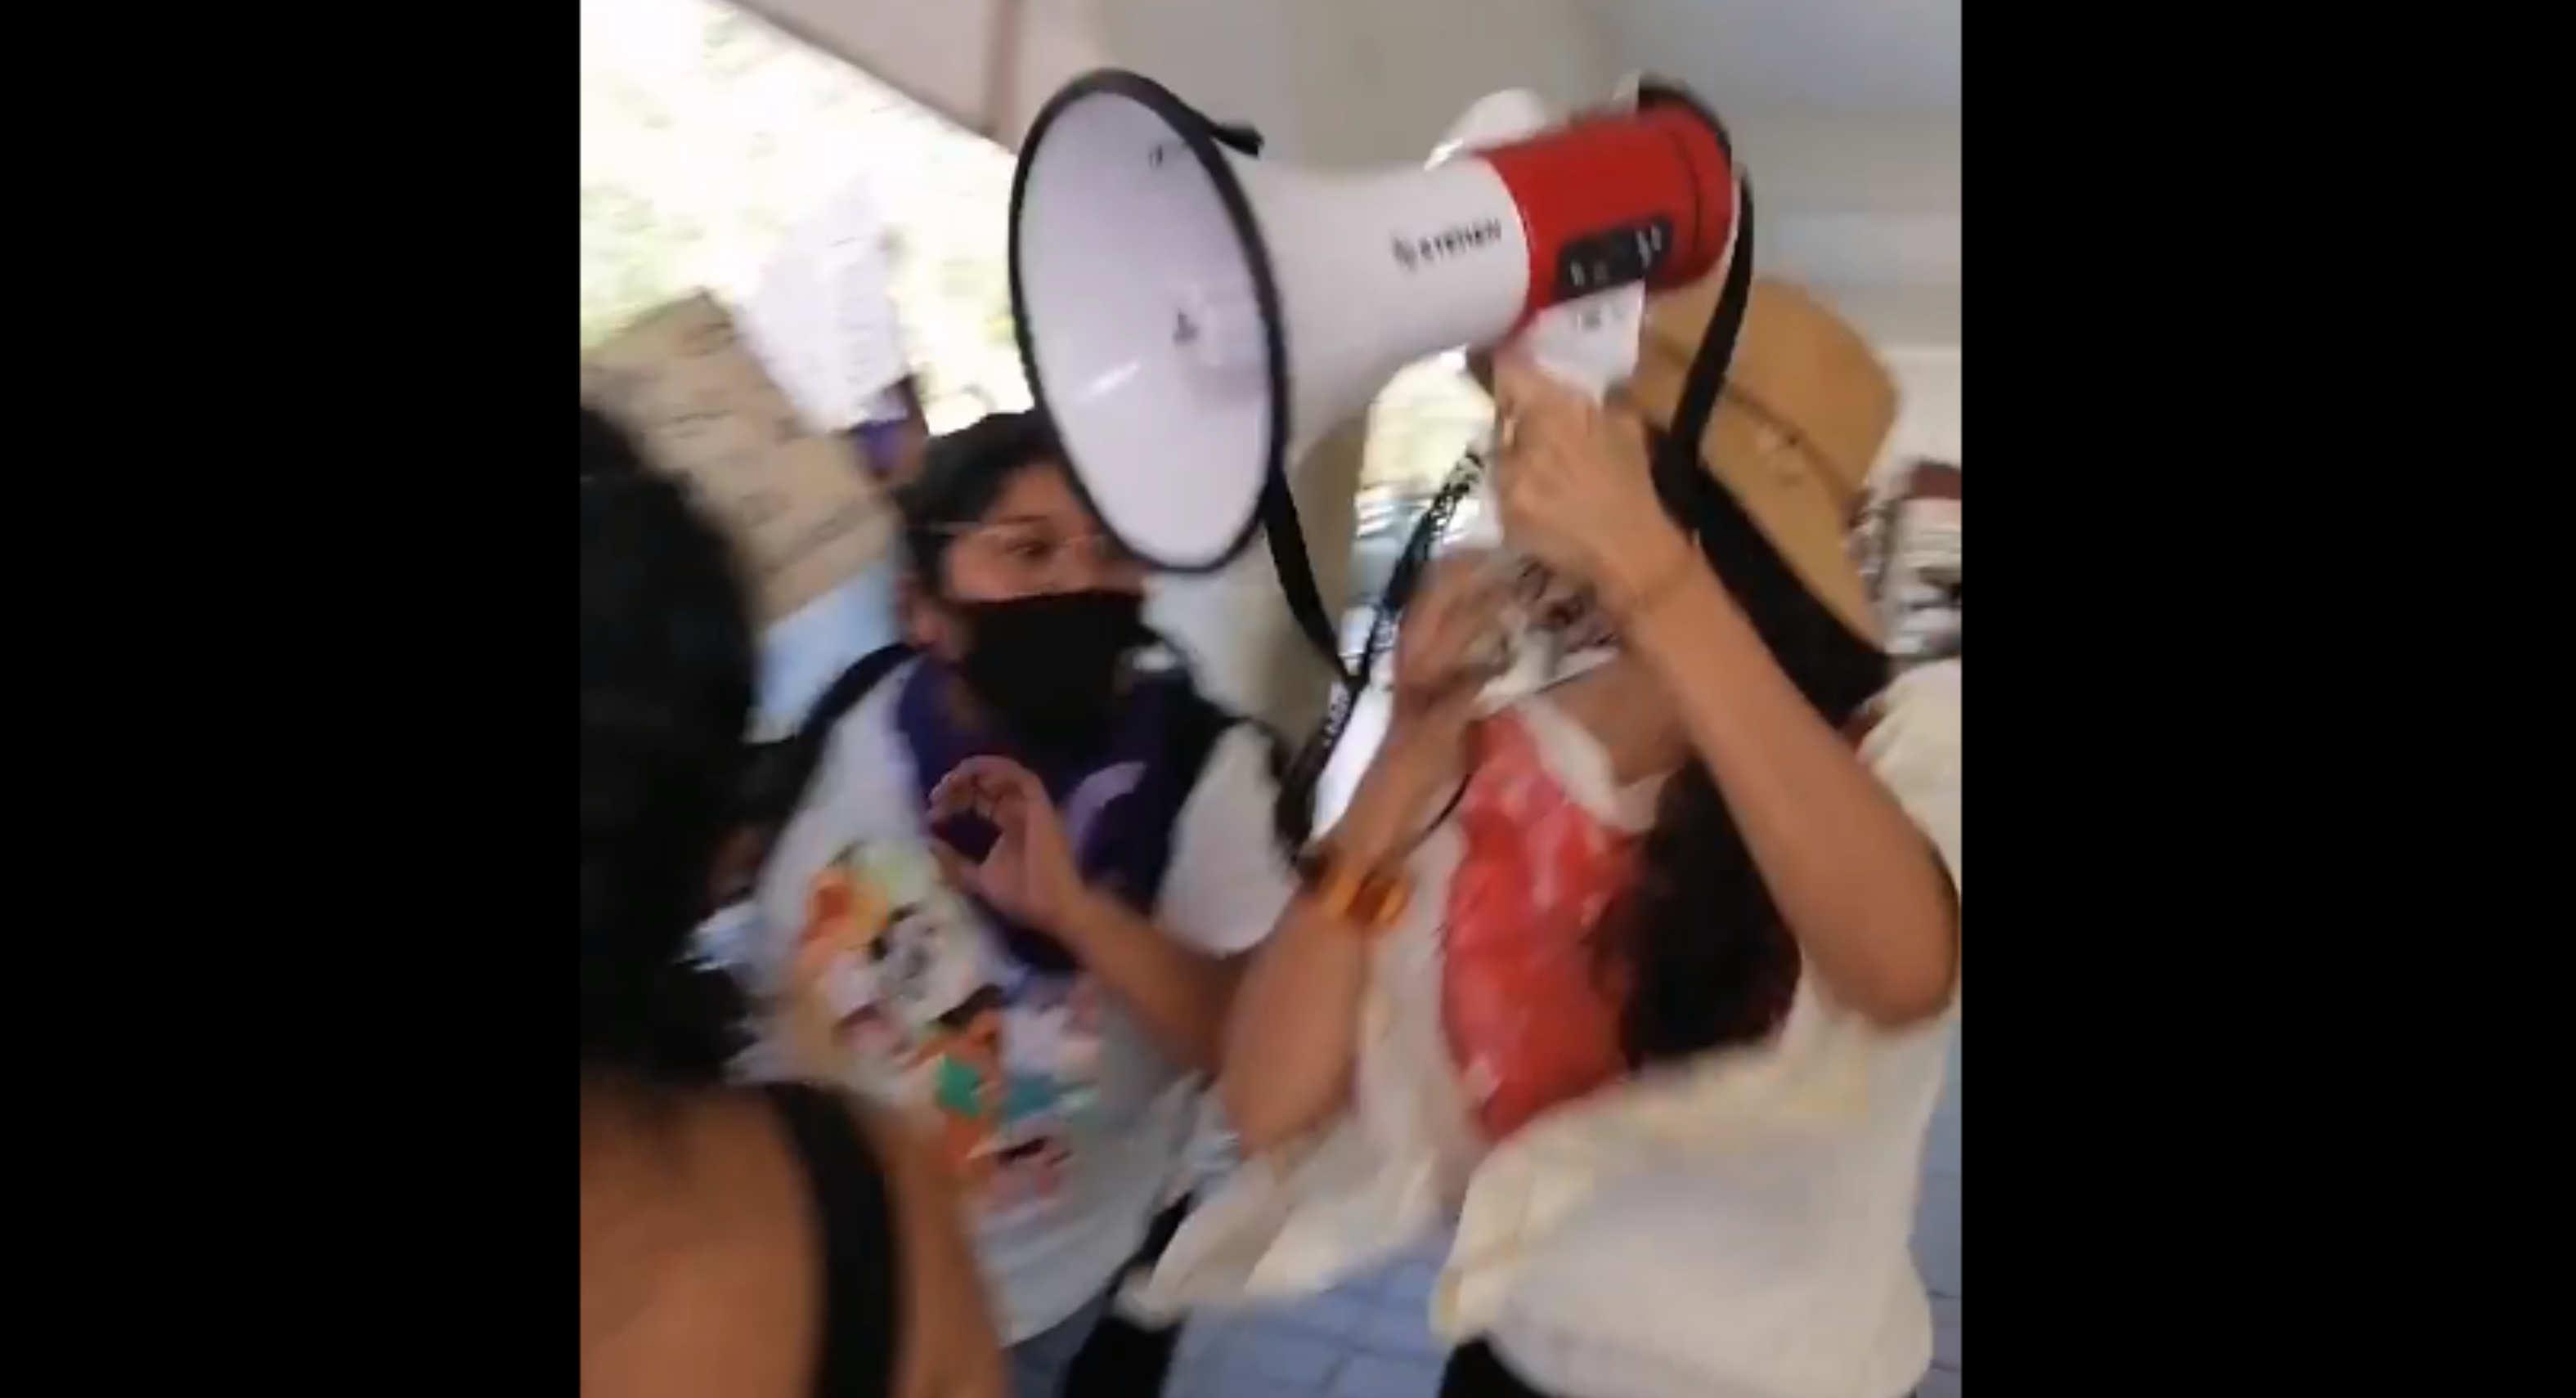 yolotzin jaimes fue agredida en iguala